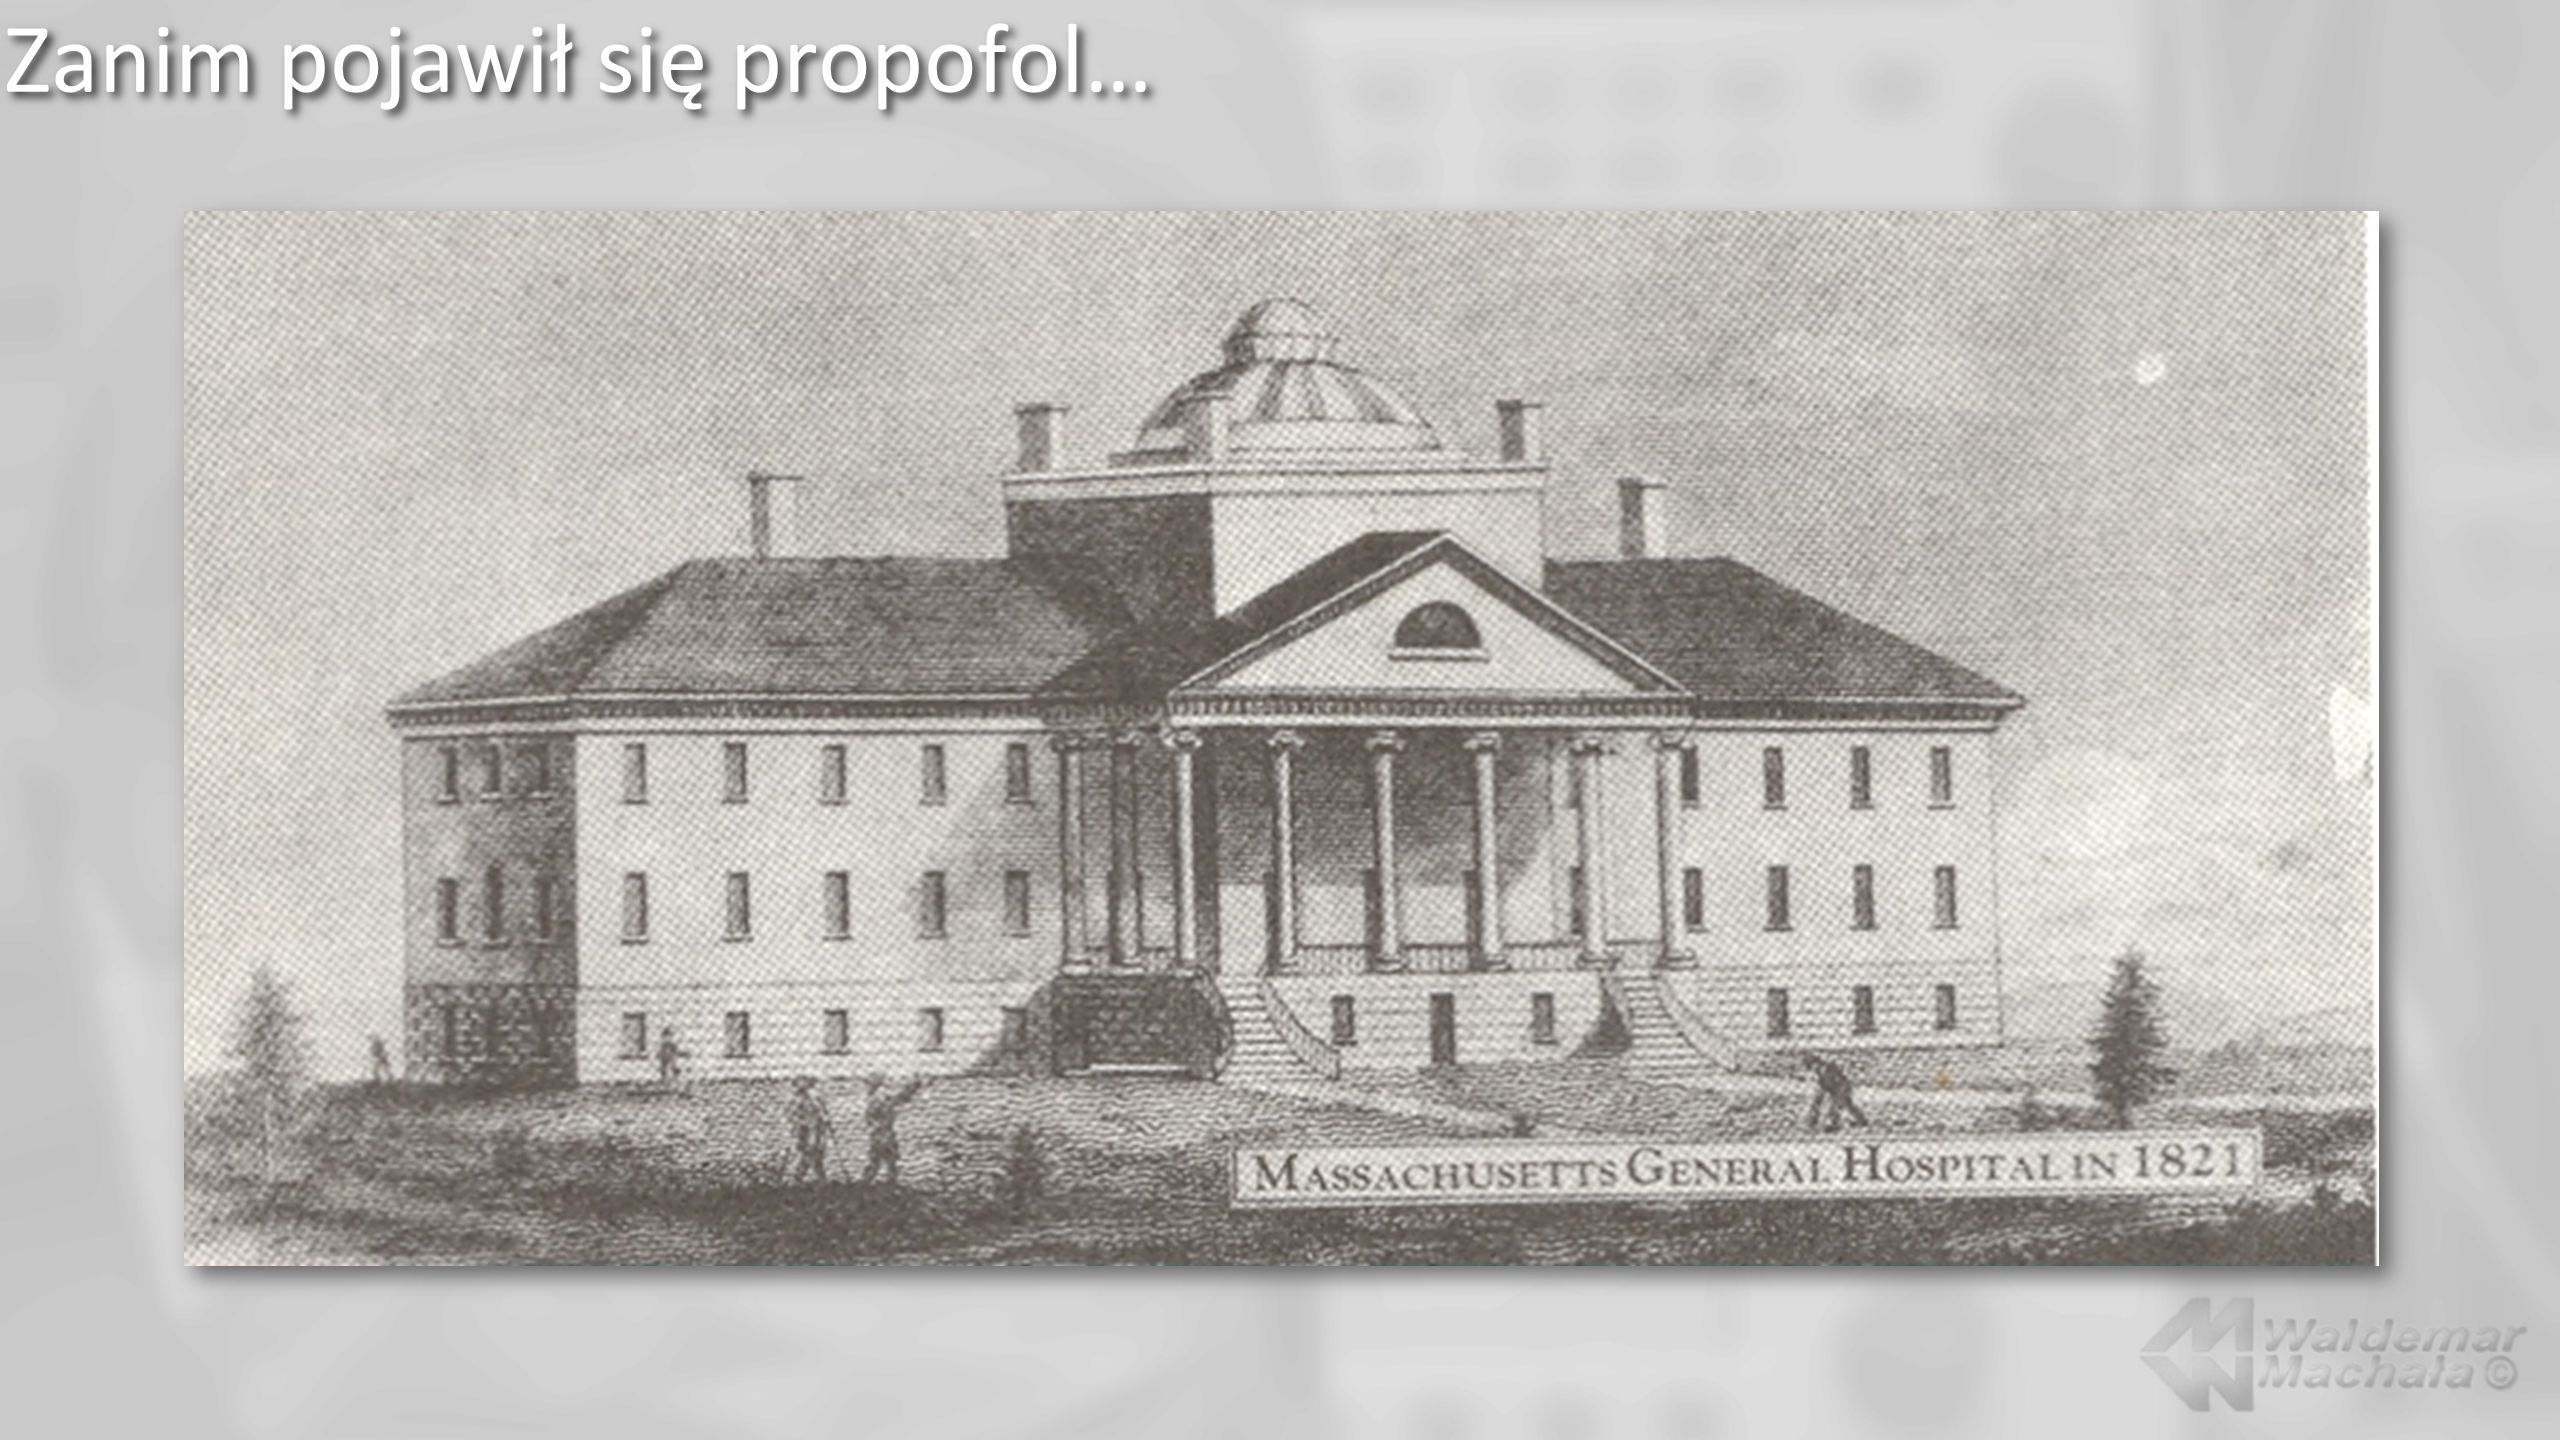 R. Hinckley: Pokaz narkozy eterowej – 16/10/1846 r. Massachusettes; 1882 r.